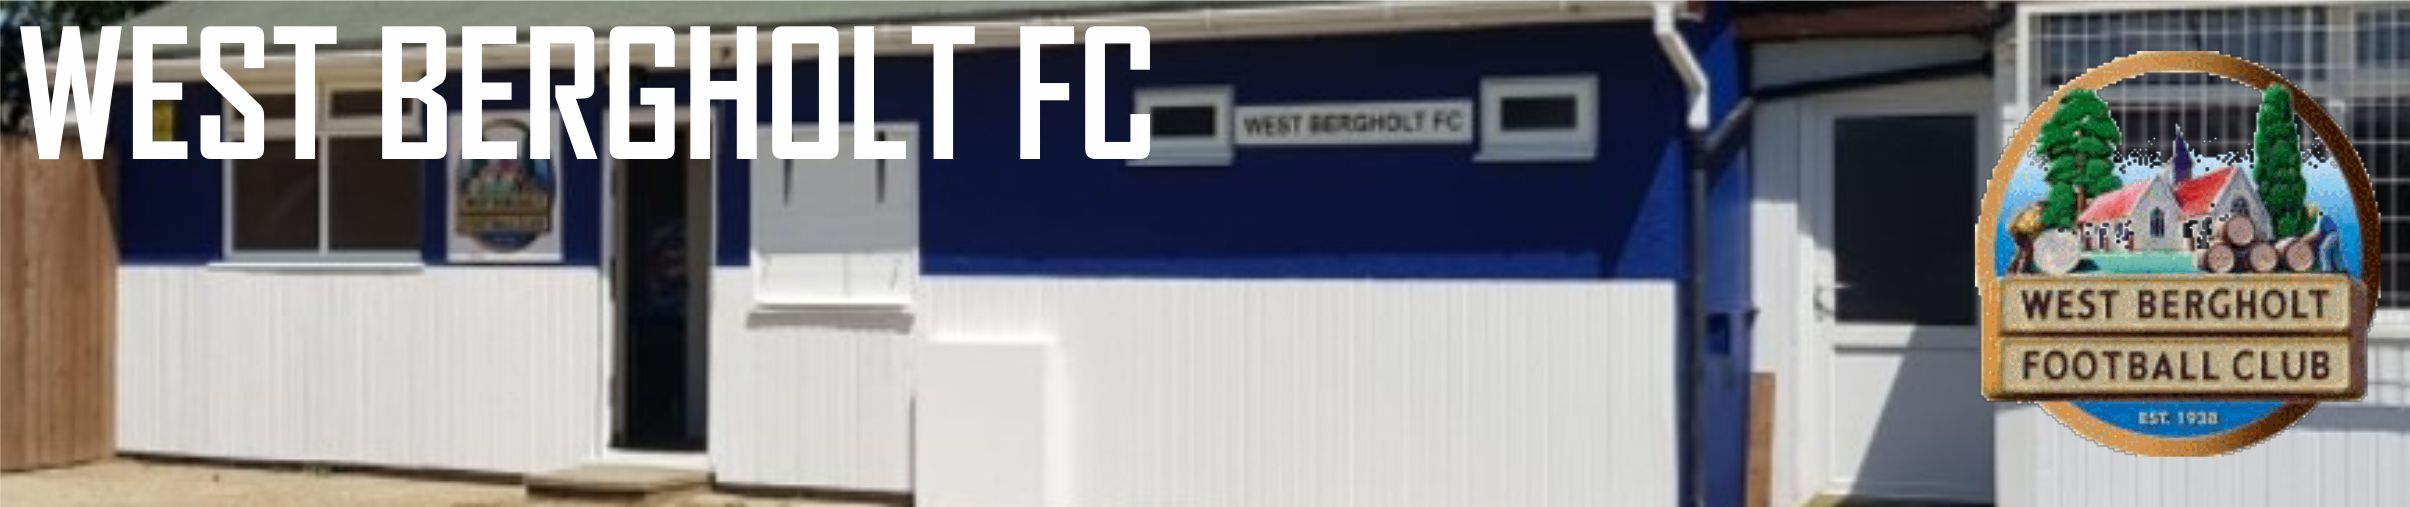 west-bergholt-banner.jpg